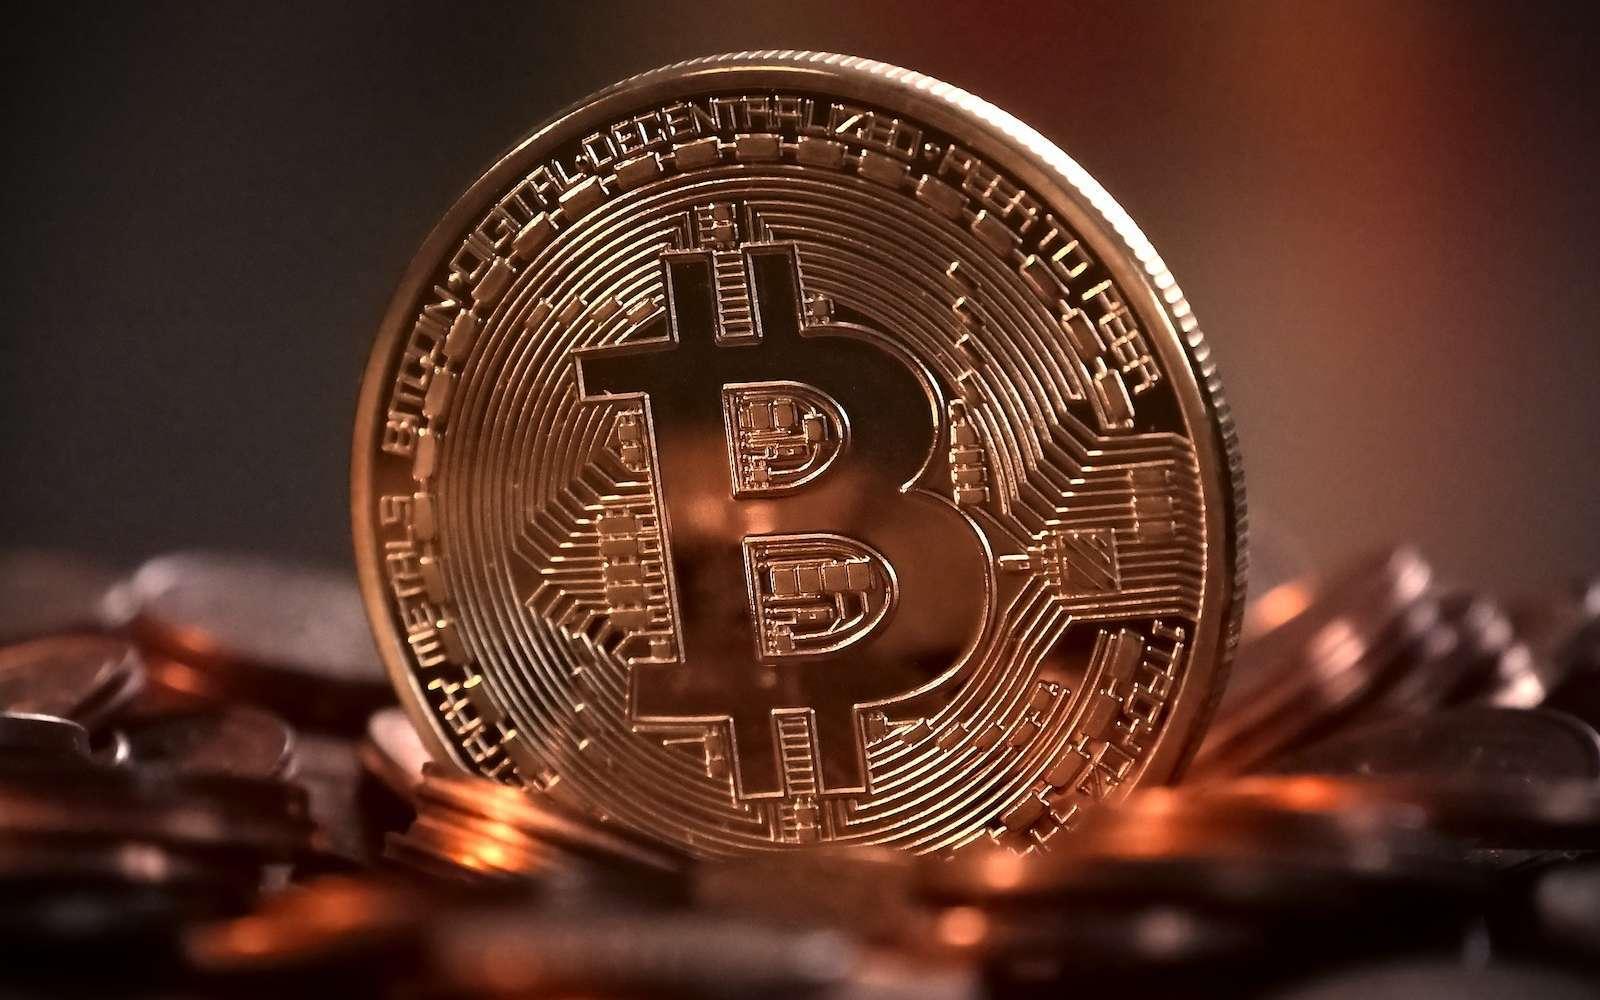 Facebook ne cherchera pas à spéculer avec sa monnaie virtuelle et promet de garantir une valeur stabilisée. © MichaelWuensch, Pixabay